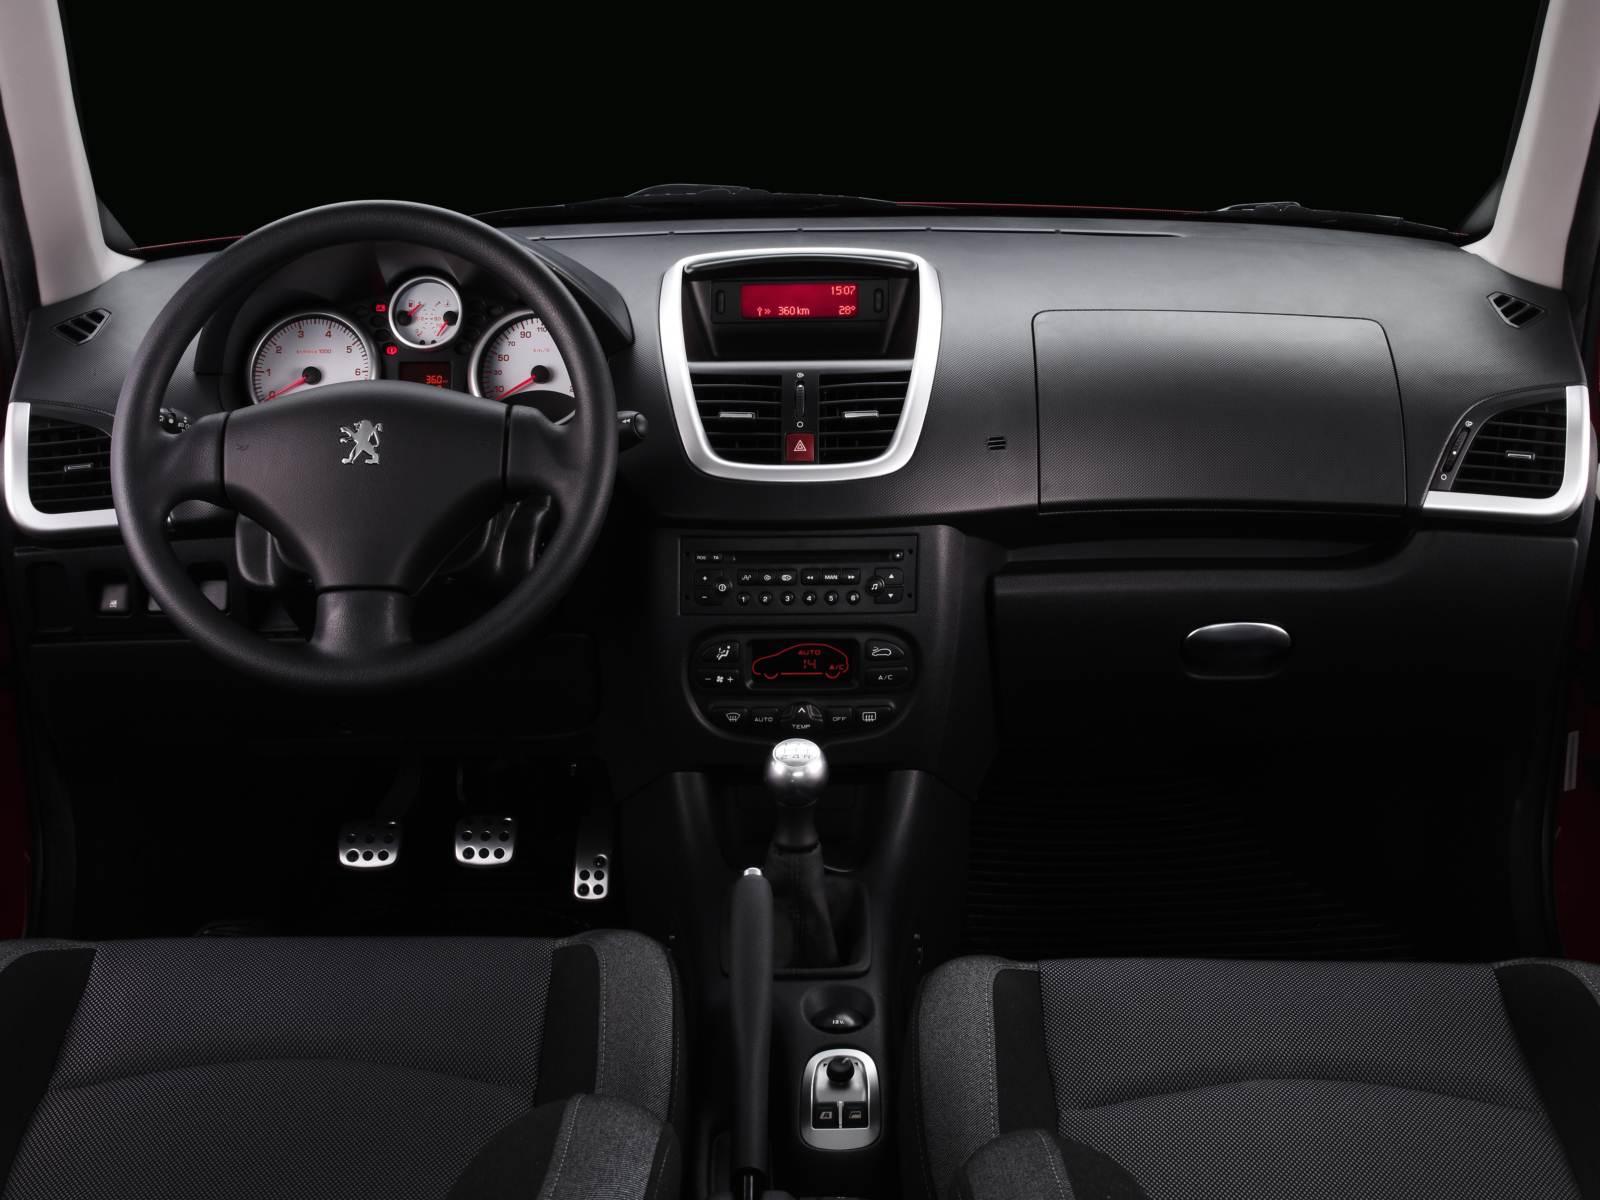 Peugeot 207 sw tem produ o encerrada enquanto hoggar for Peugeot 207 interior